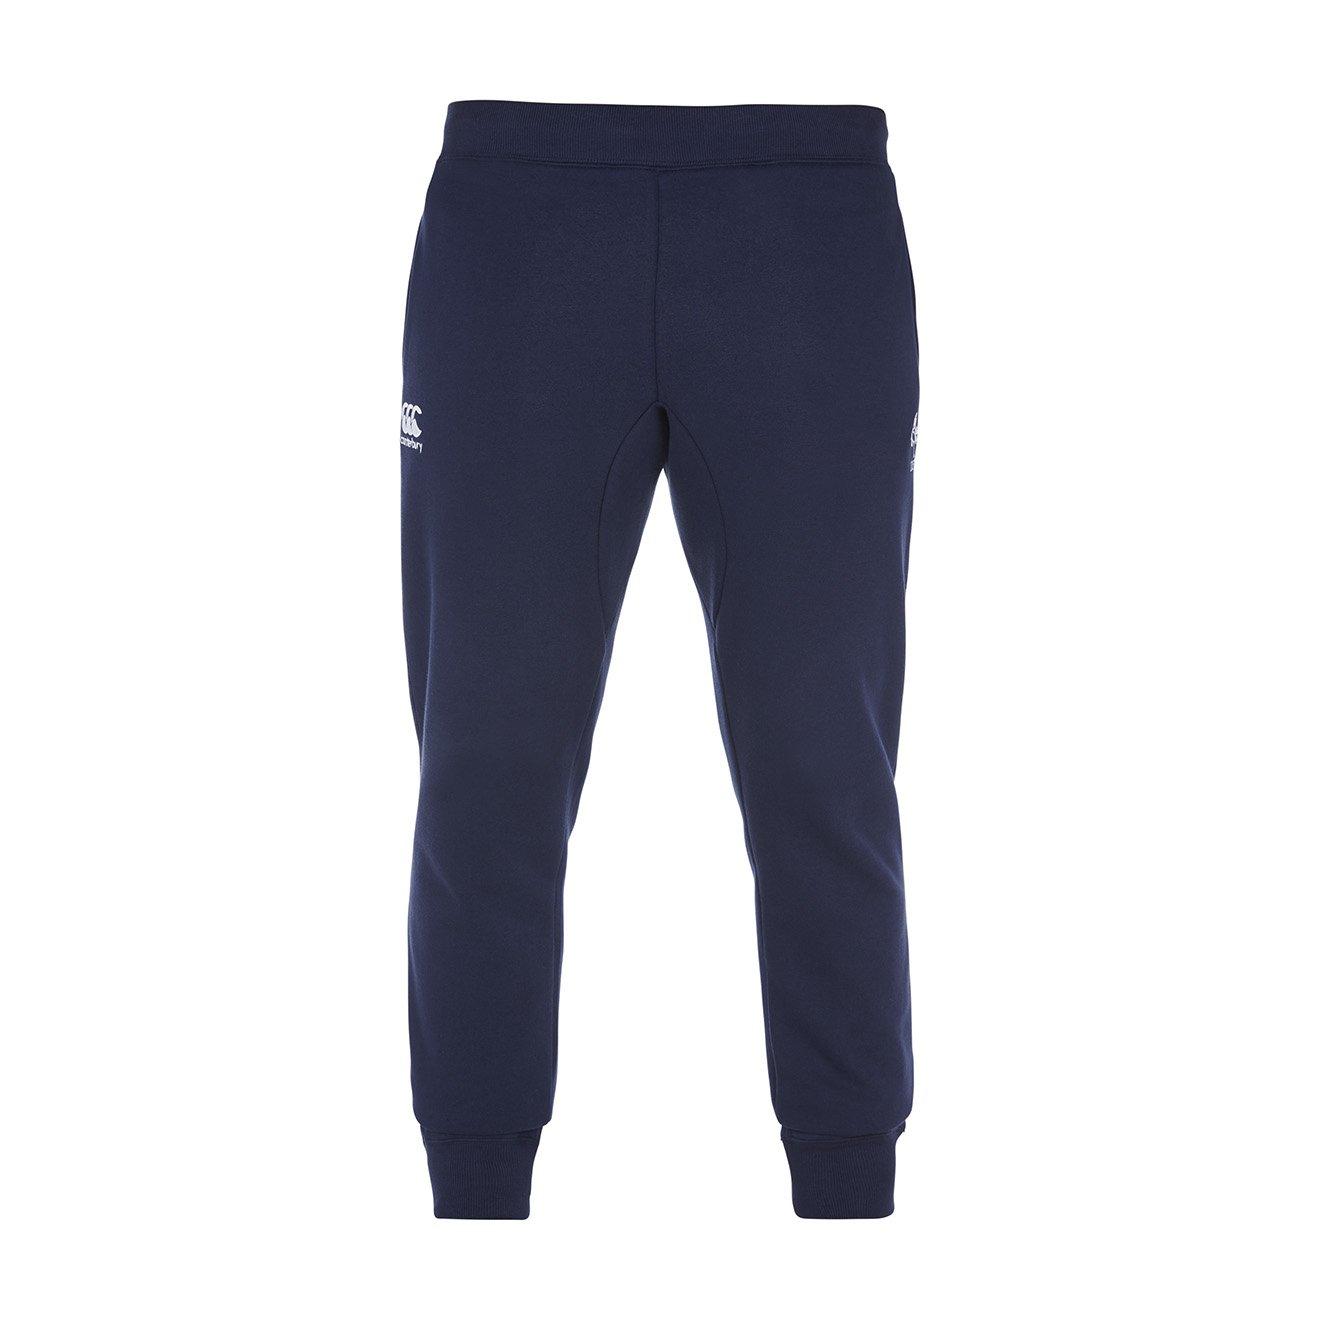 Canterbury Of New Zealand Men's Ireland Cuffed Tapered Fleece Pant-Peacoat Blue, Small